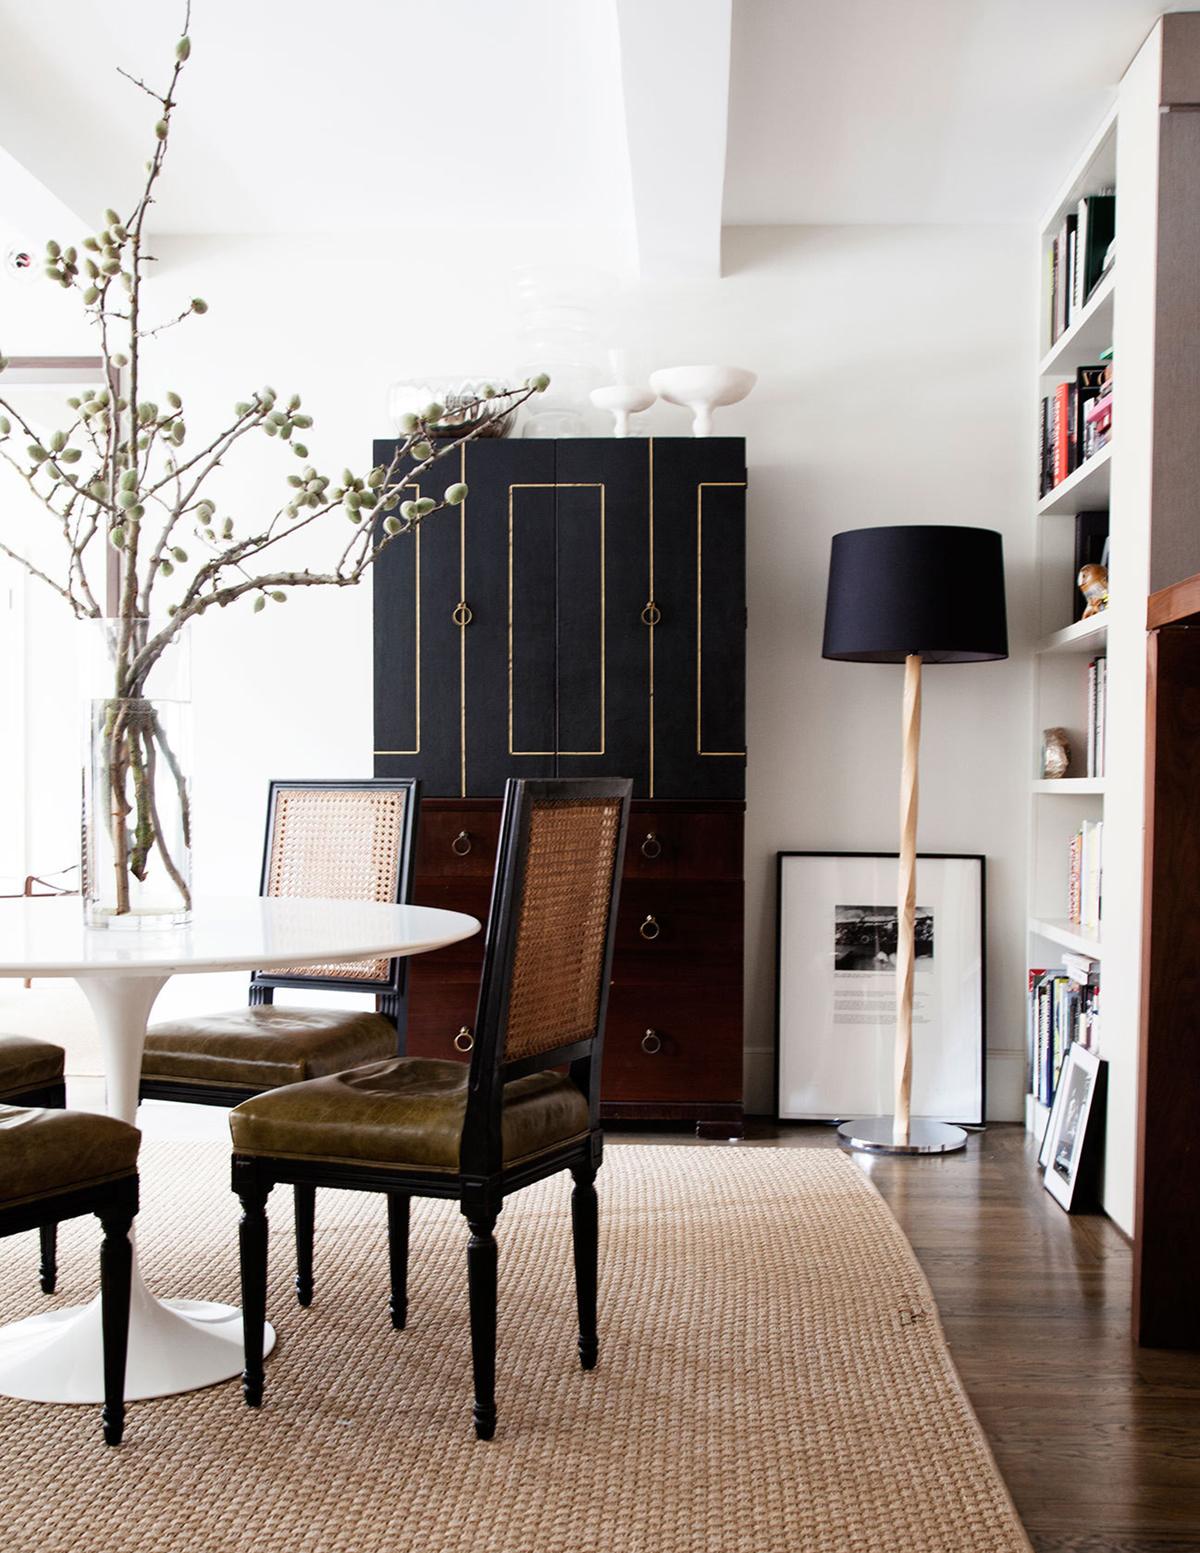 lighting designs Unique Lighting Designs Shine in Mid-Century Living Room Room of the Week Mid Century Living Room in Designer   s Home 6